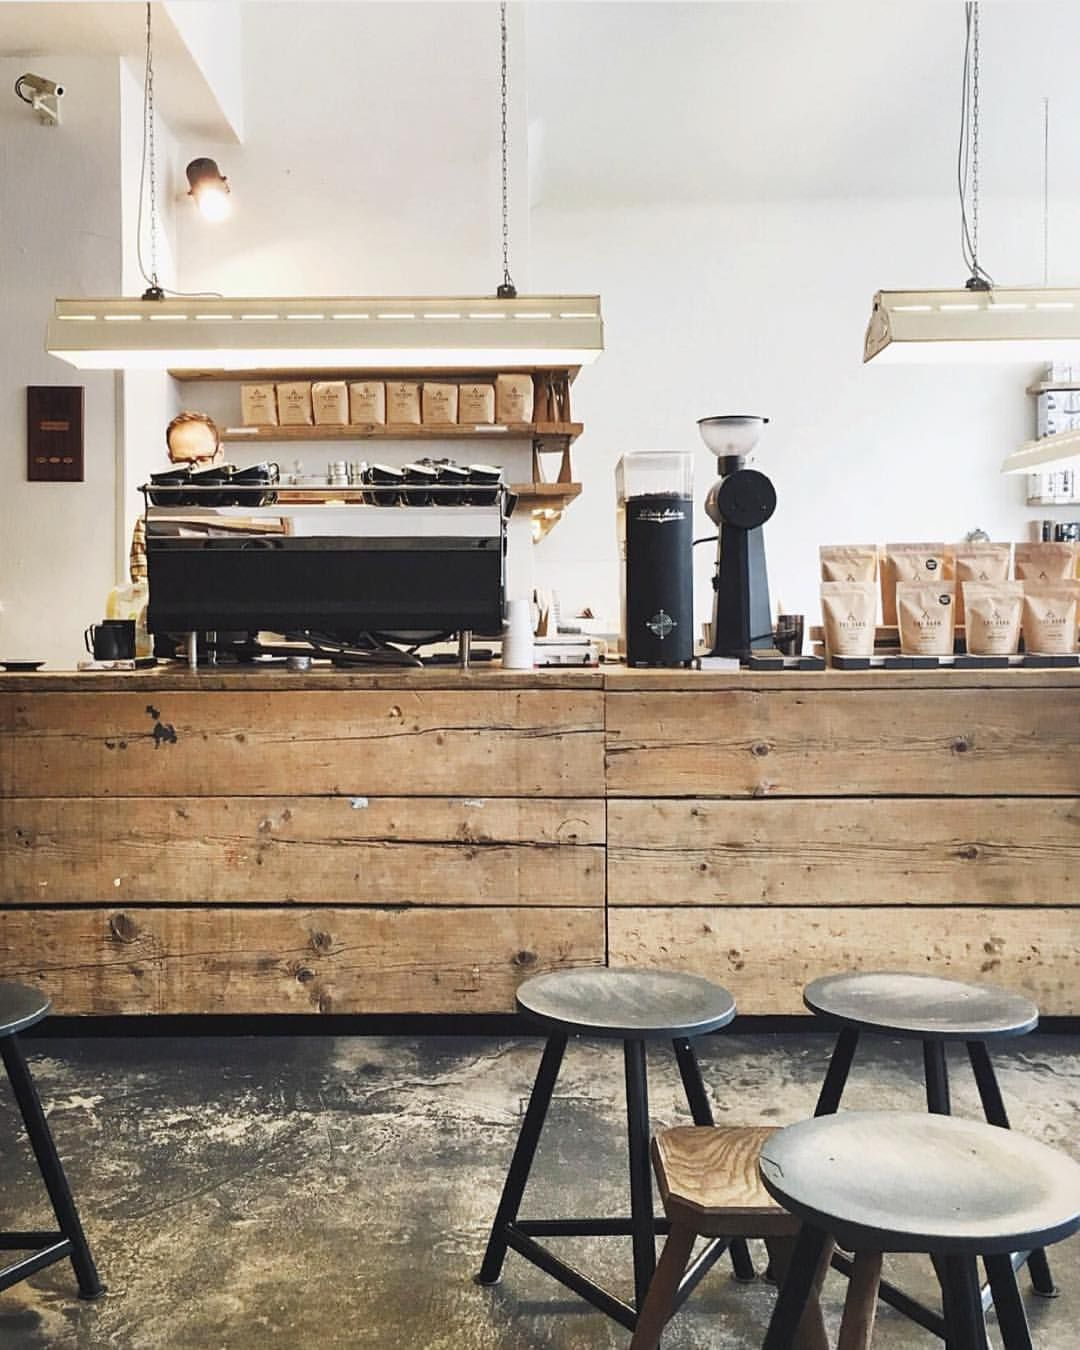 Espresso bar at thebarnberlin dcily acmecups